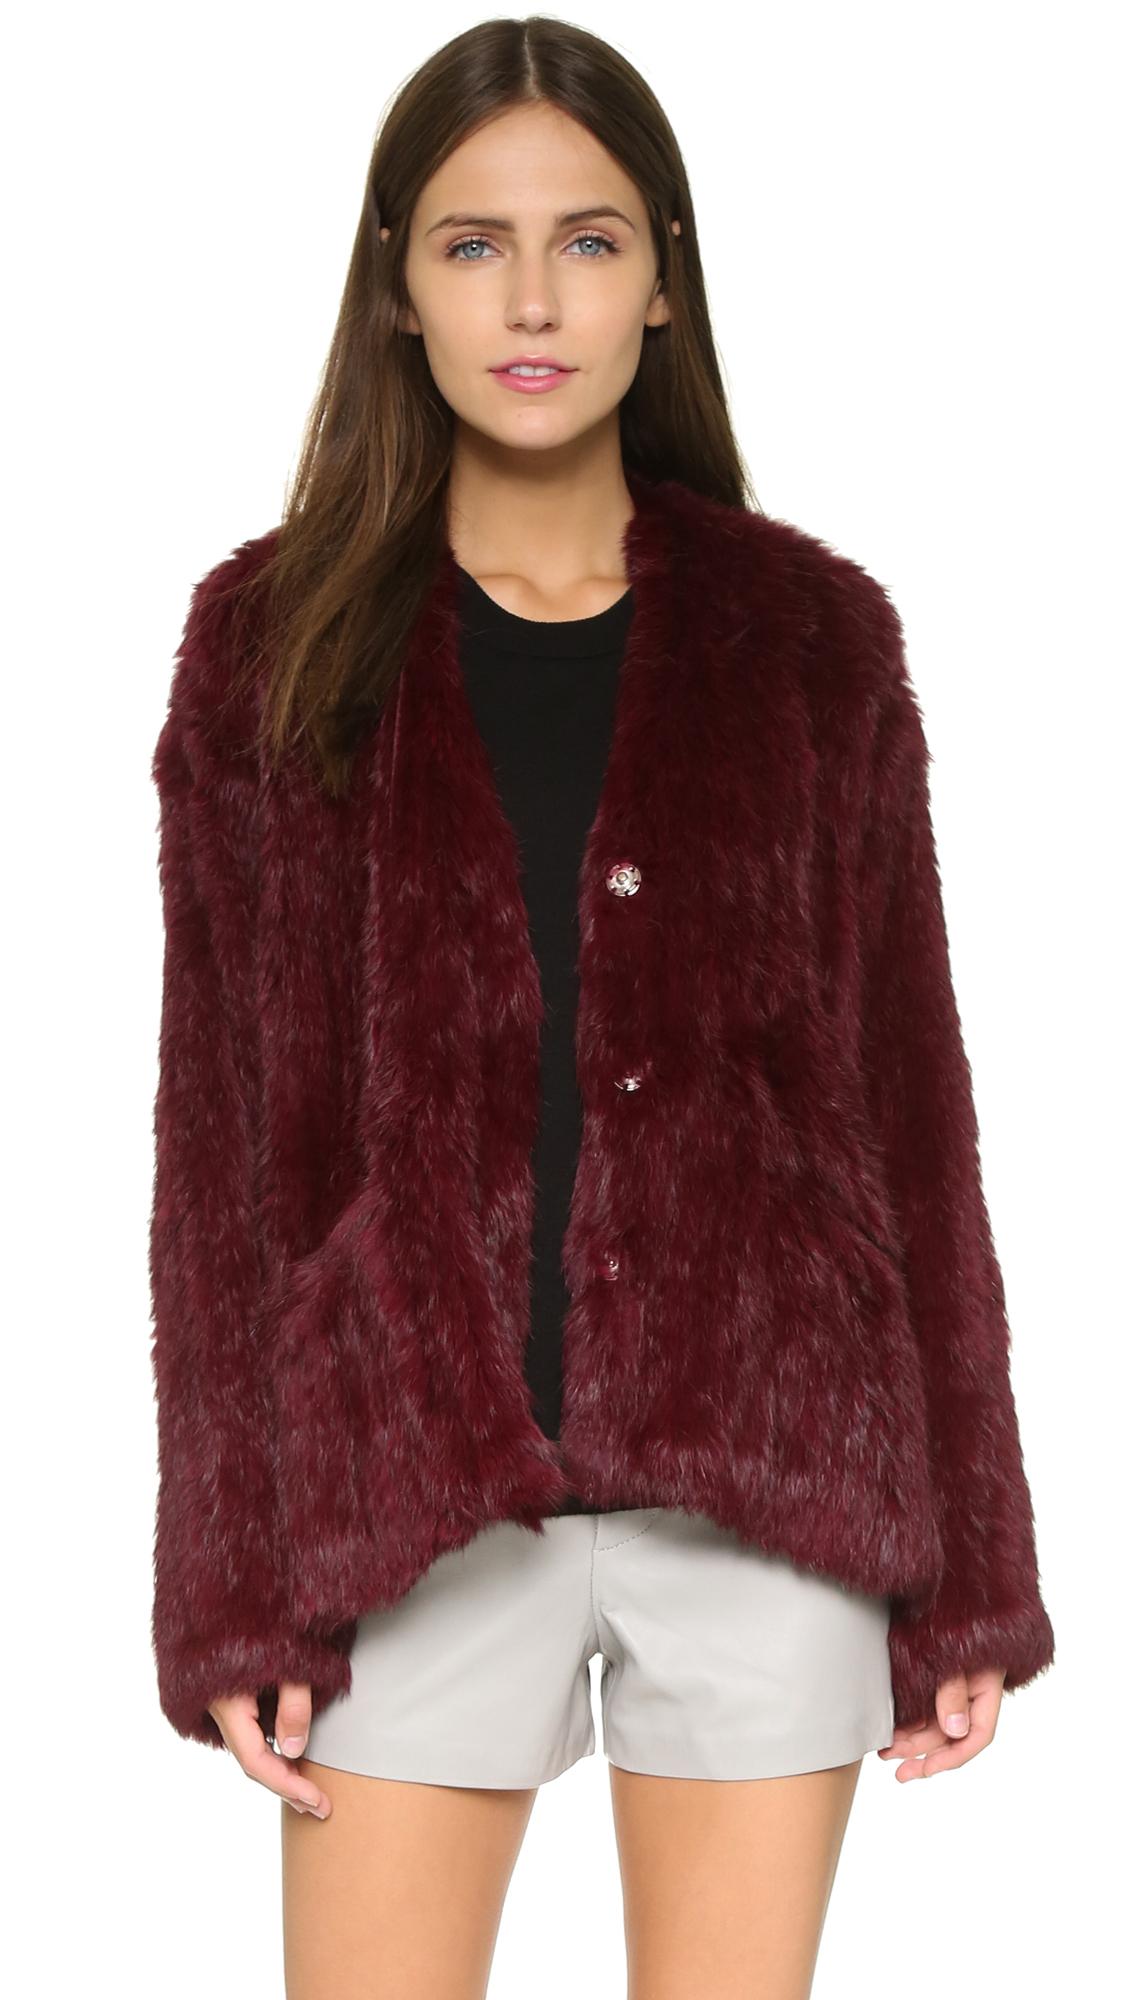 lyst elizabeth and james collarless bianca fur jacket merlot in purple. Black Bedroom Furniture Sets. Home Design Ideas